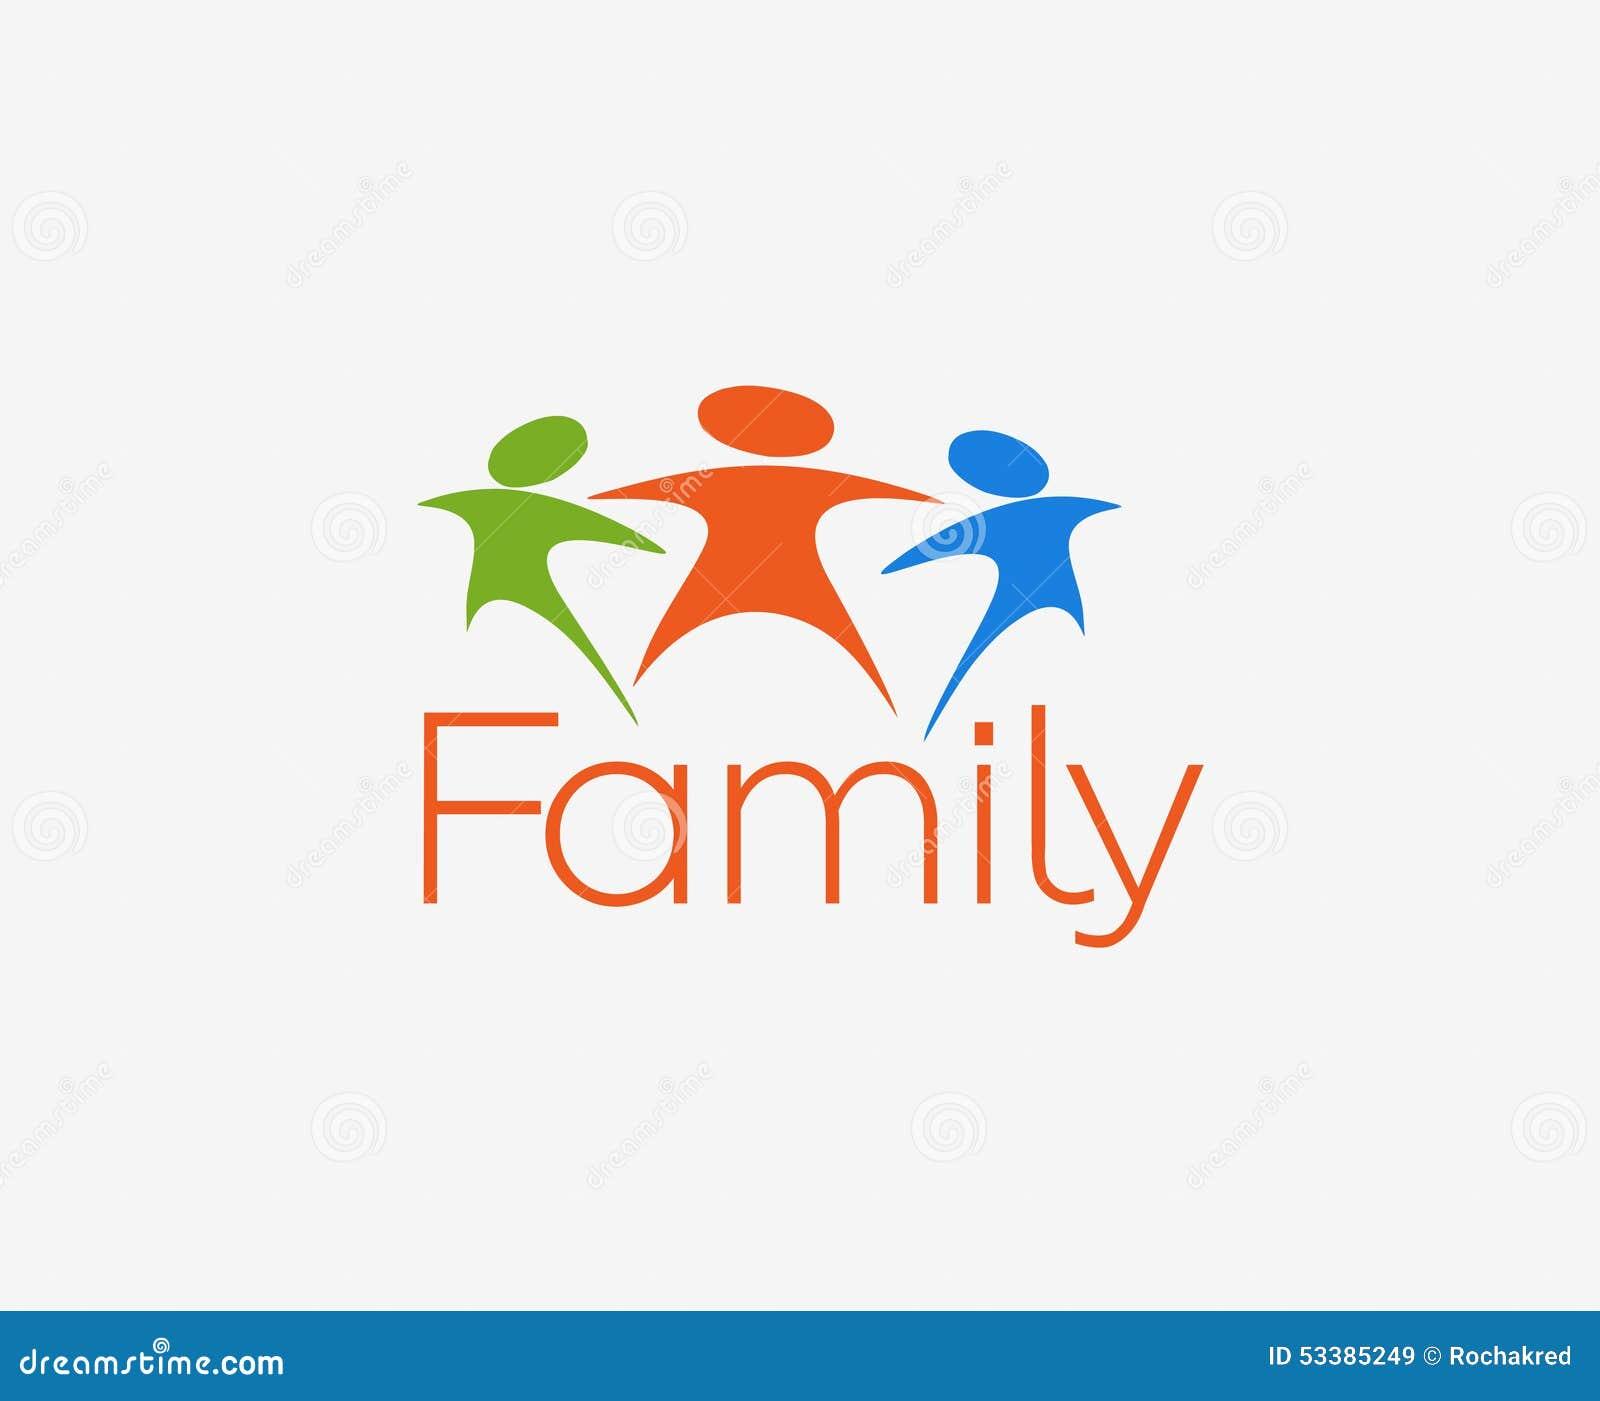 Cartoon vector family